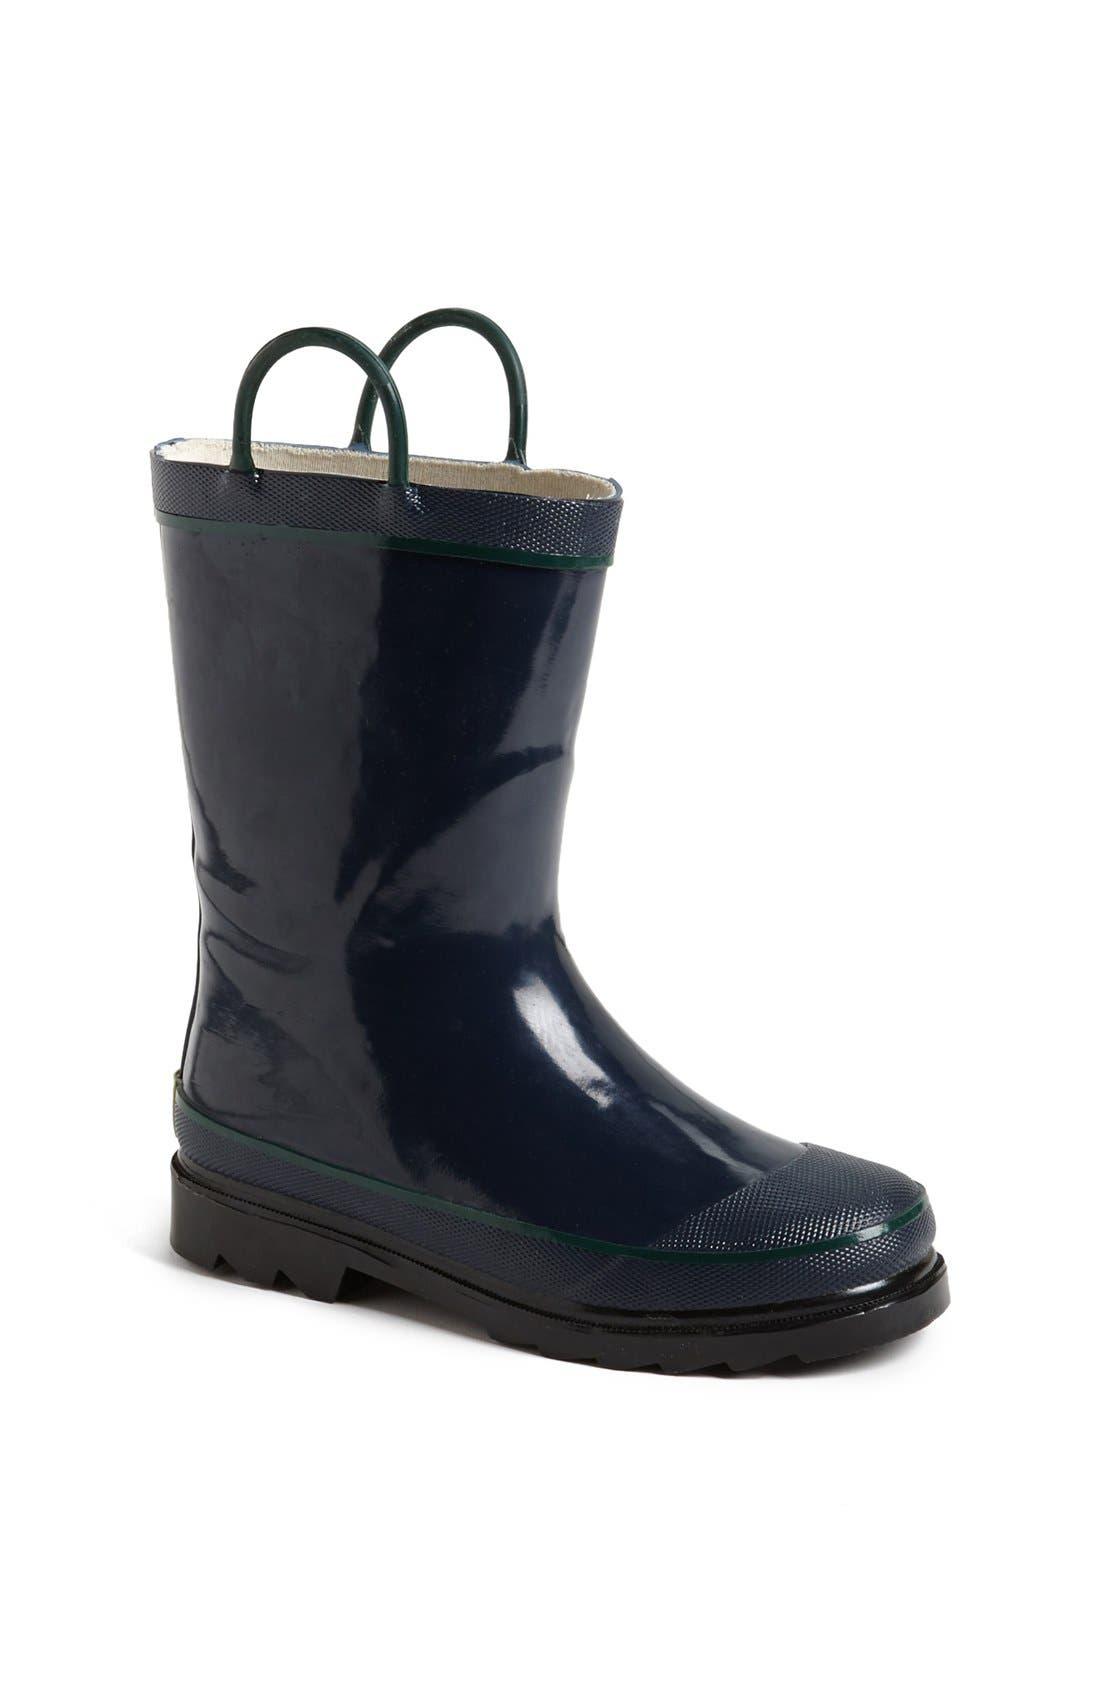 WESTERN CHIEF Firechief 2 Waterproof Rain Boot, Main, color, NAVY